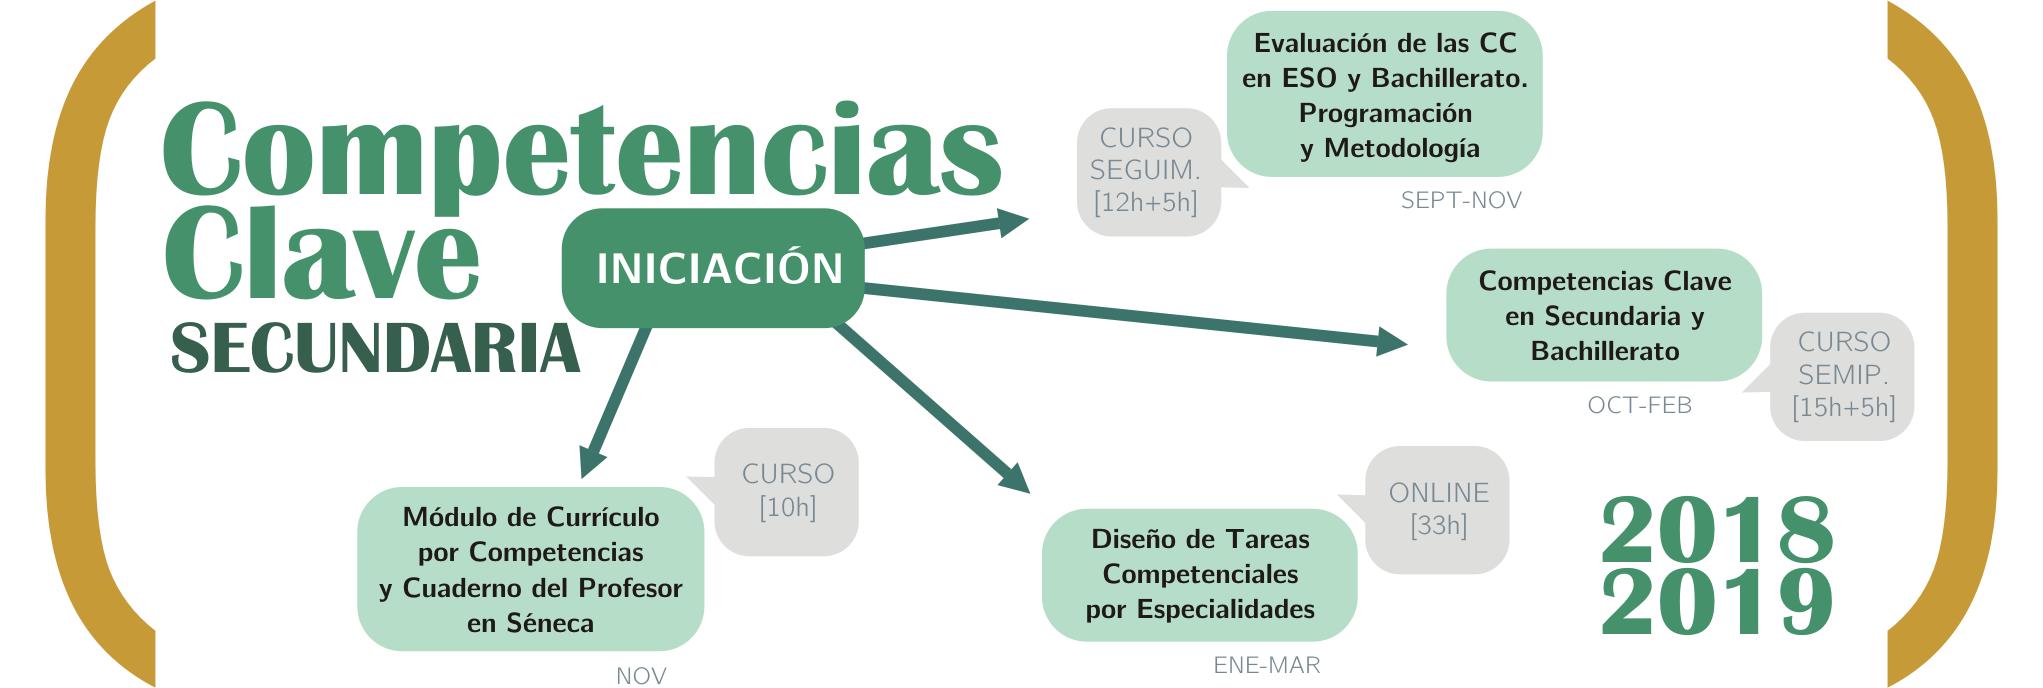 Itinerario de iniciación en competencias clave para secundaria